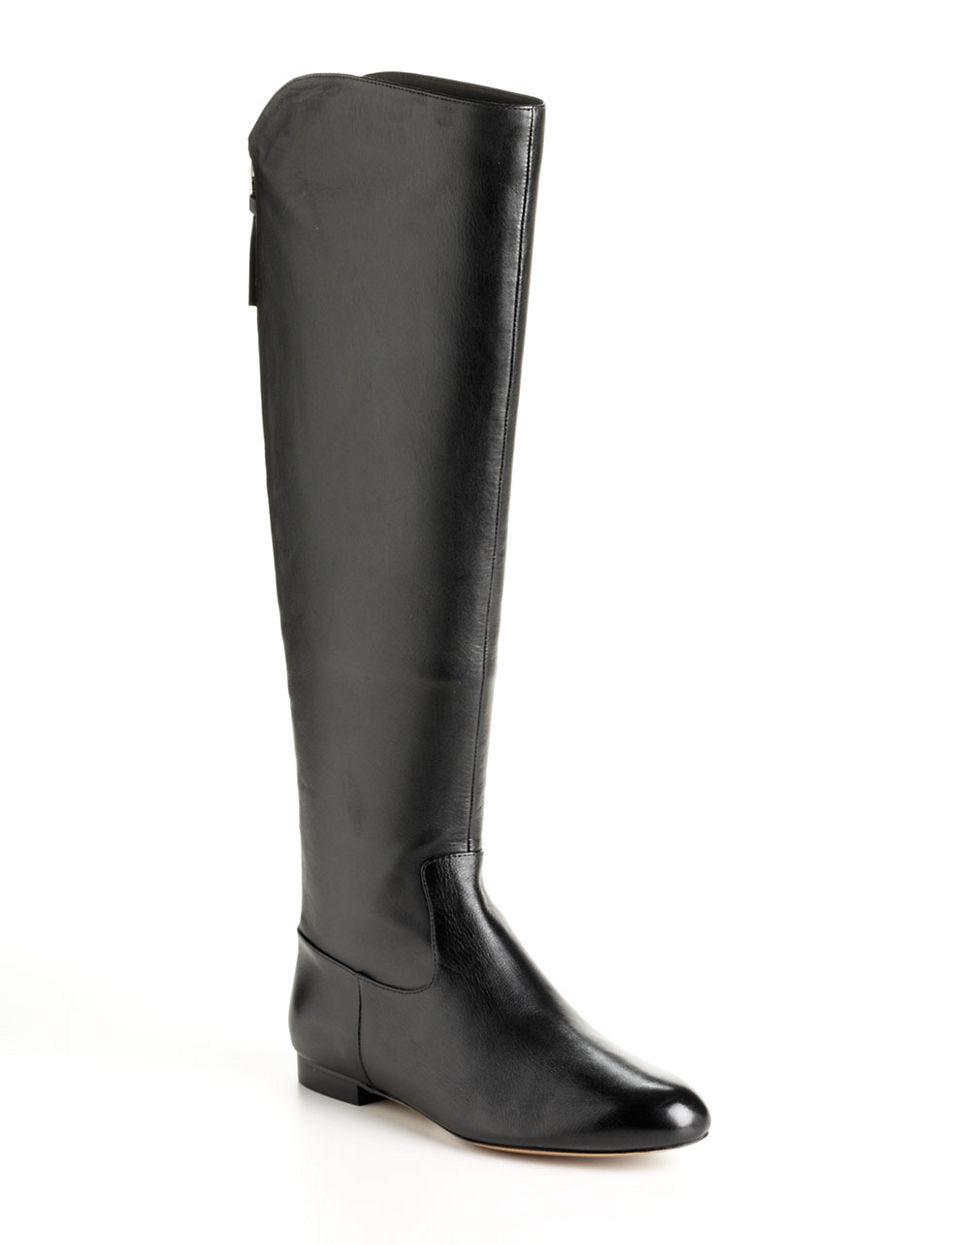 elie tahari suede boots in black lyst